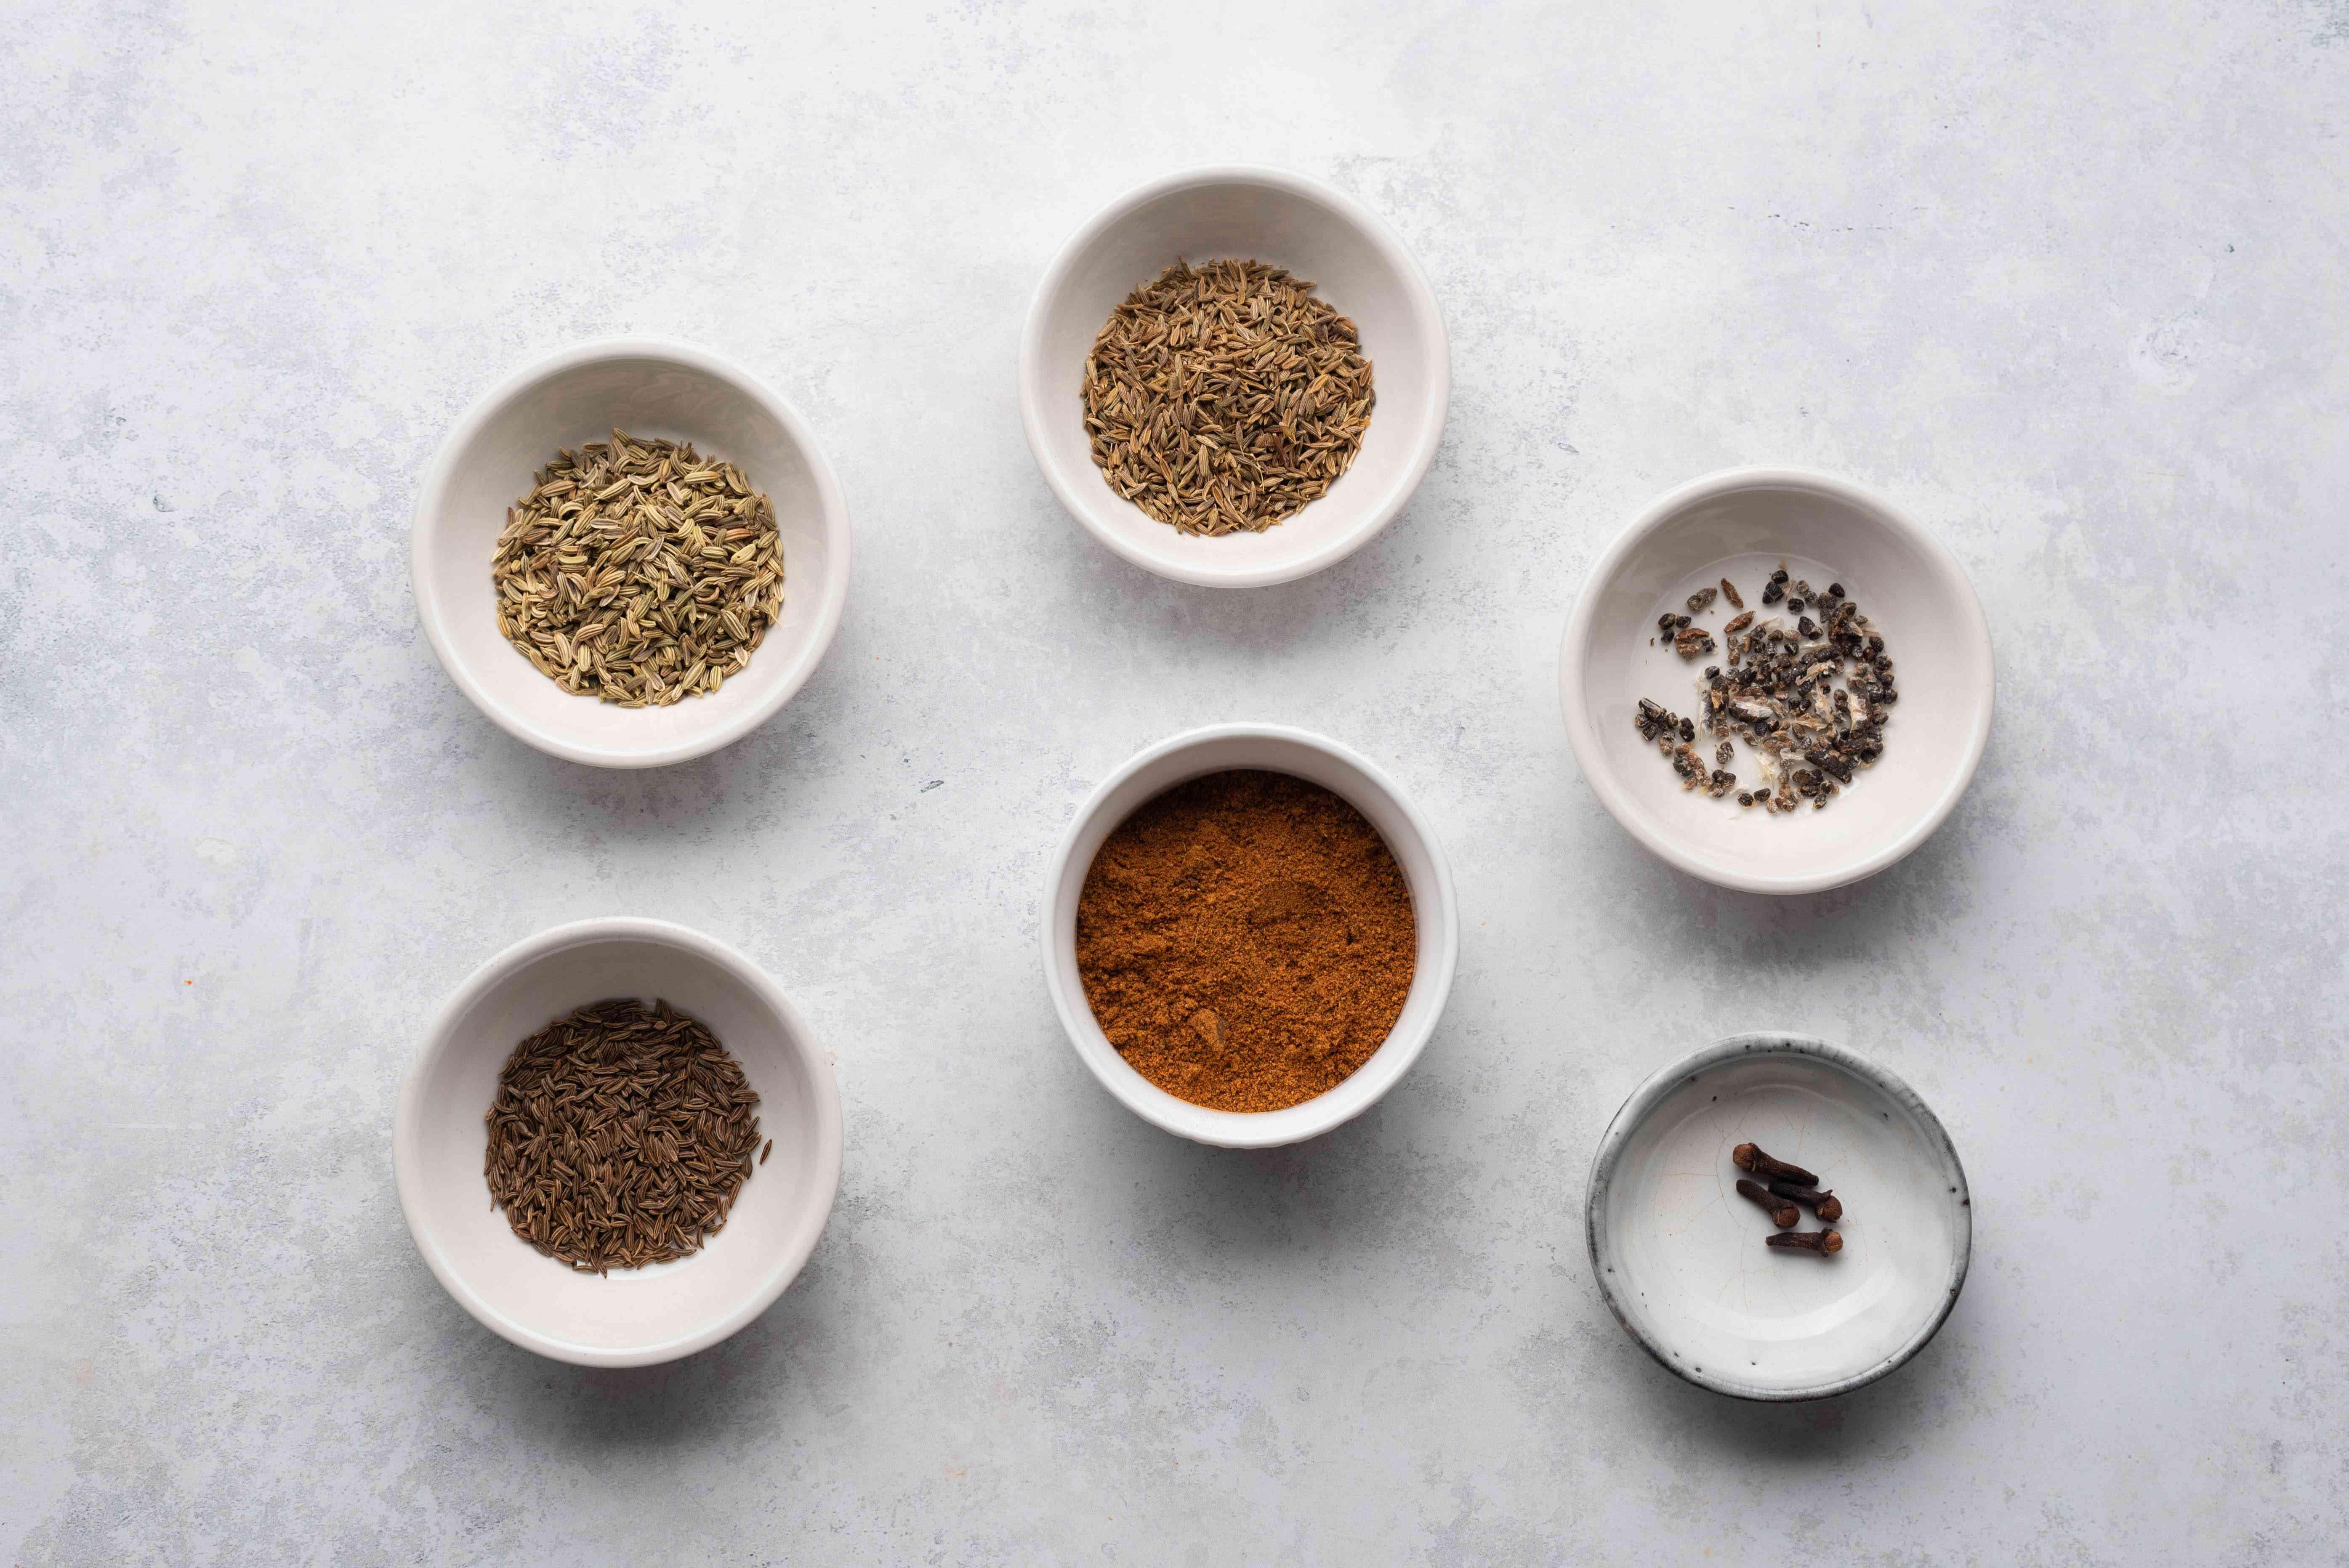 spice mix ingredients